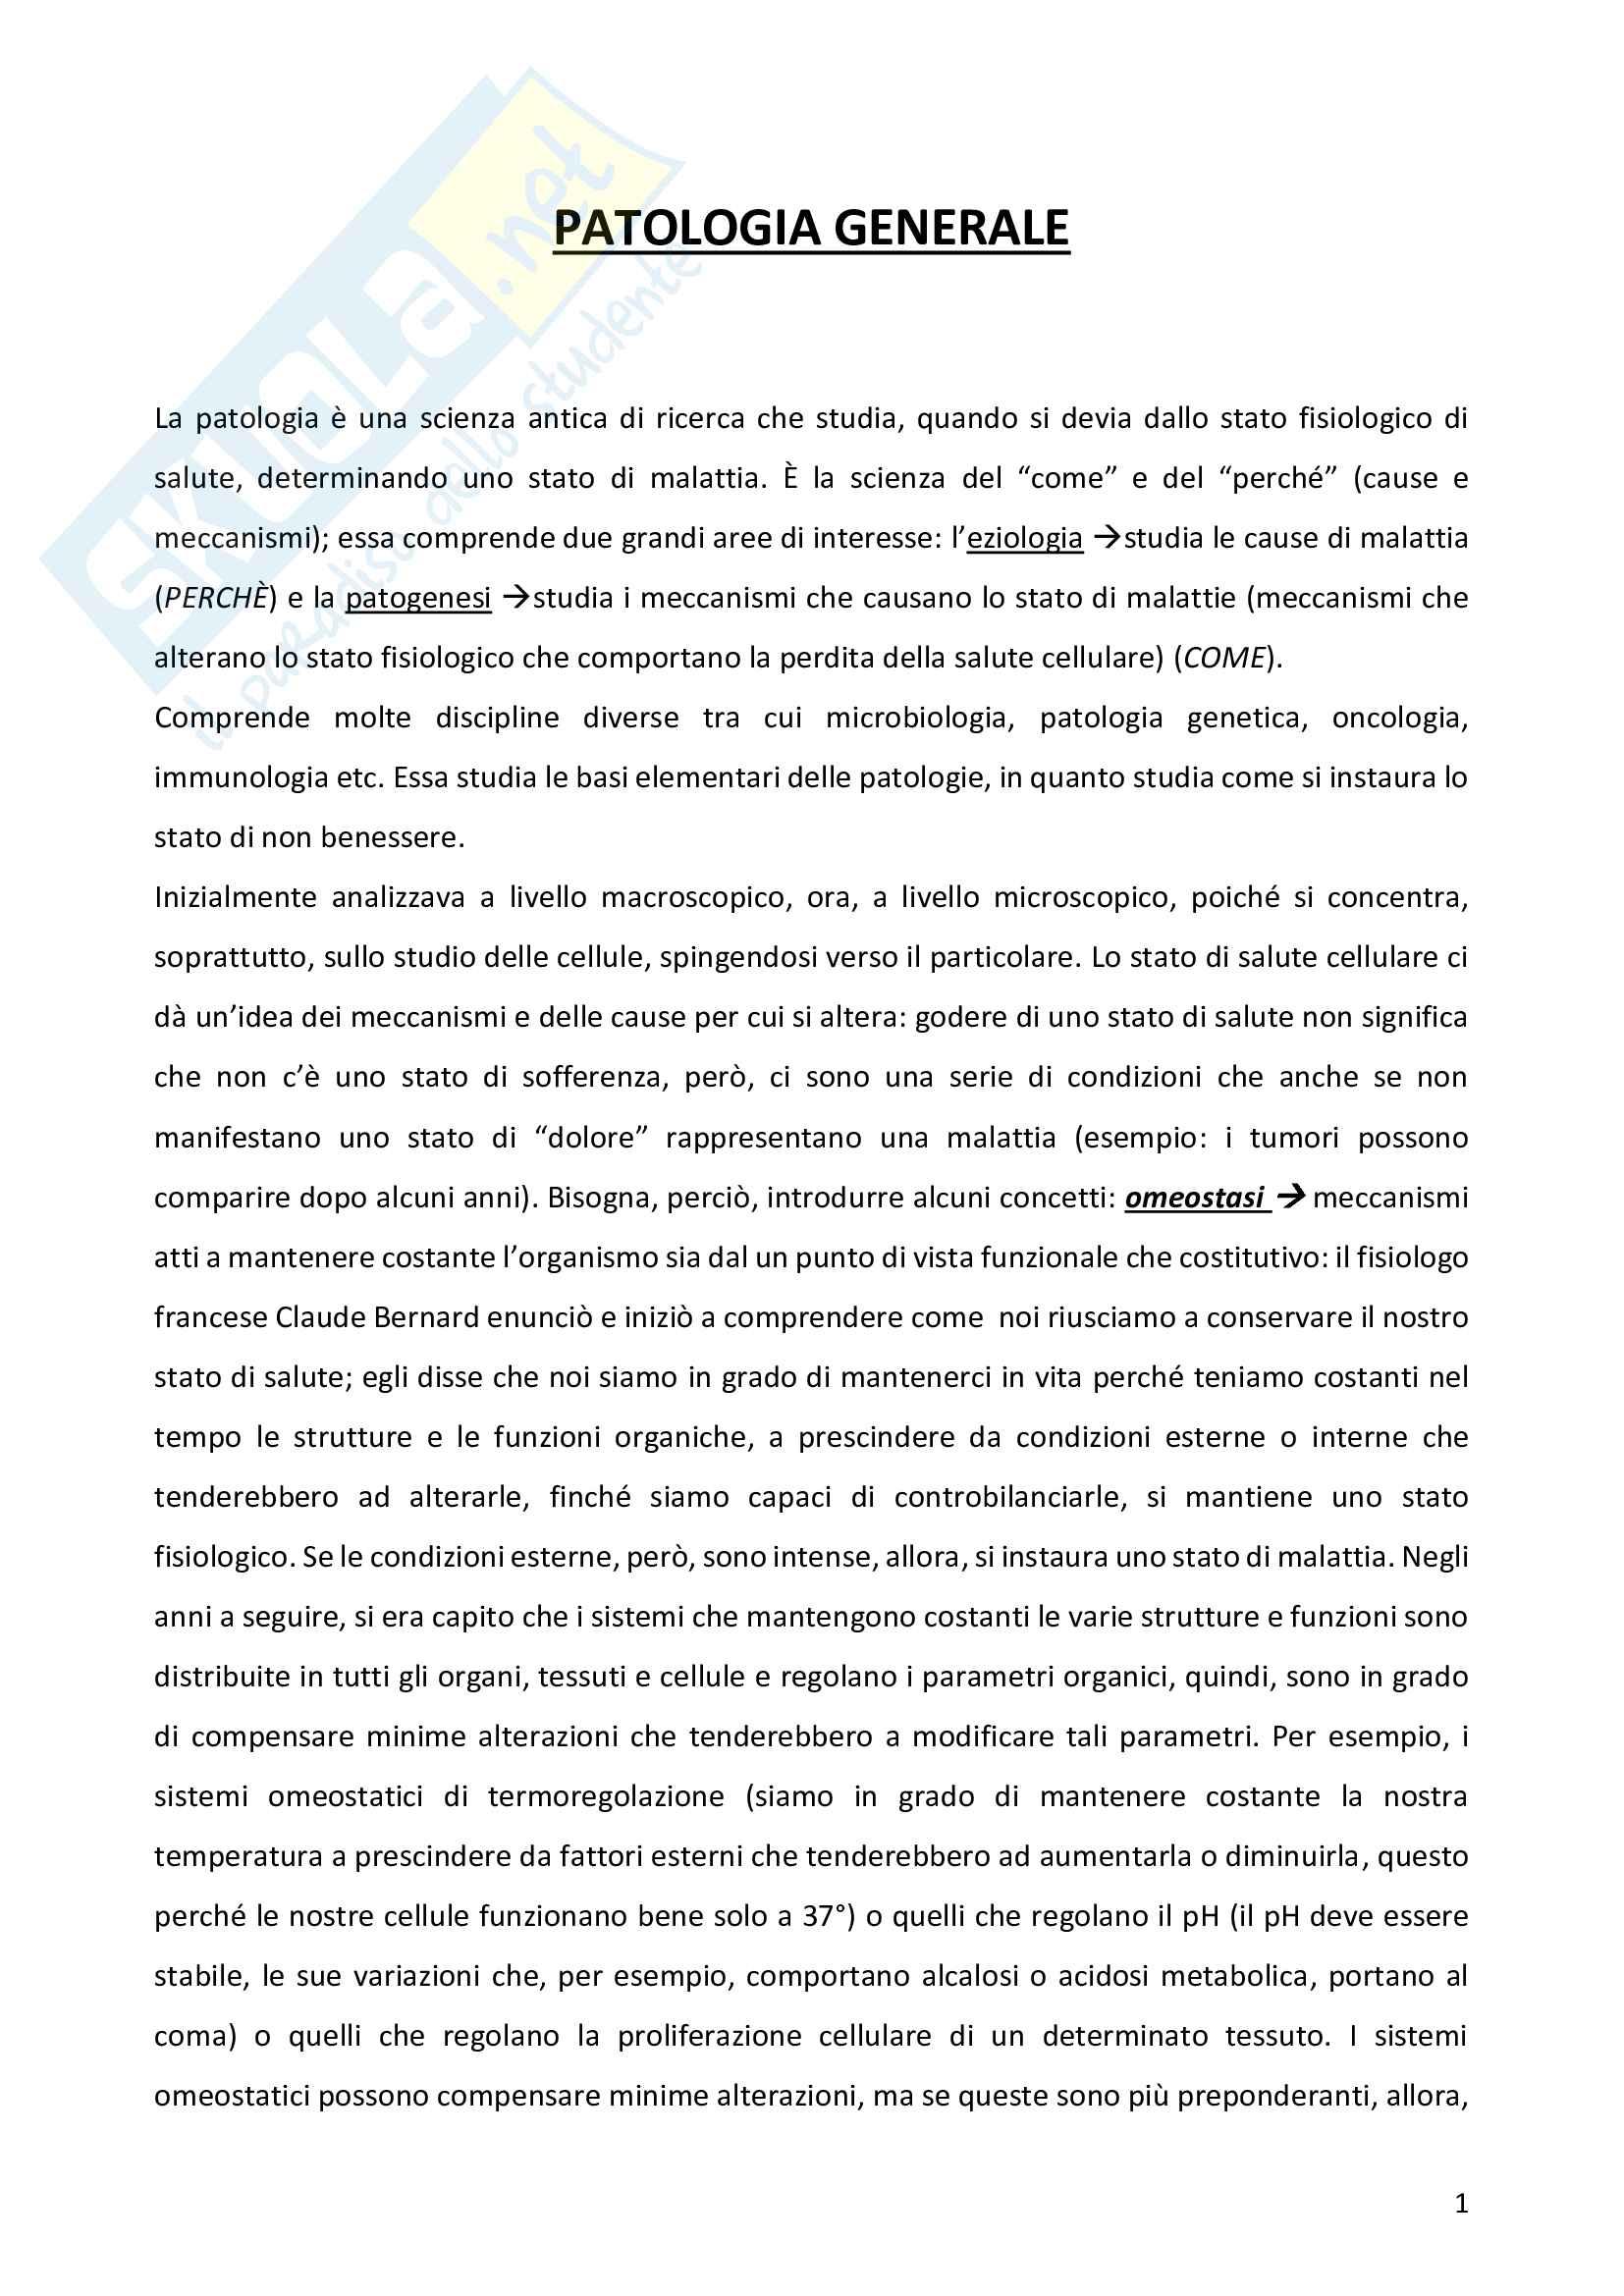 Appunti Patologia Generale